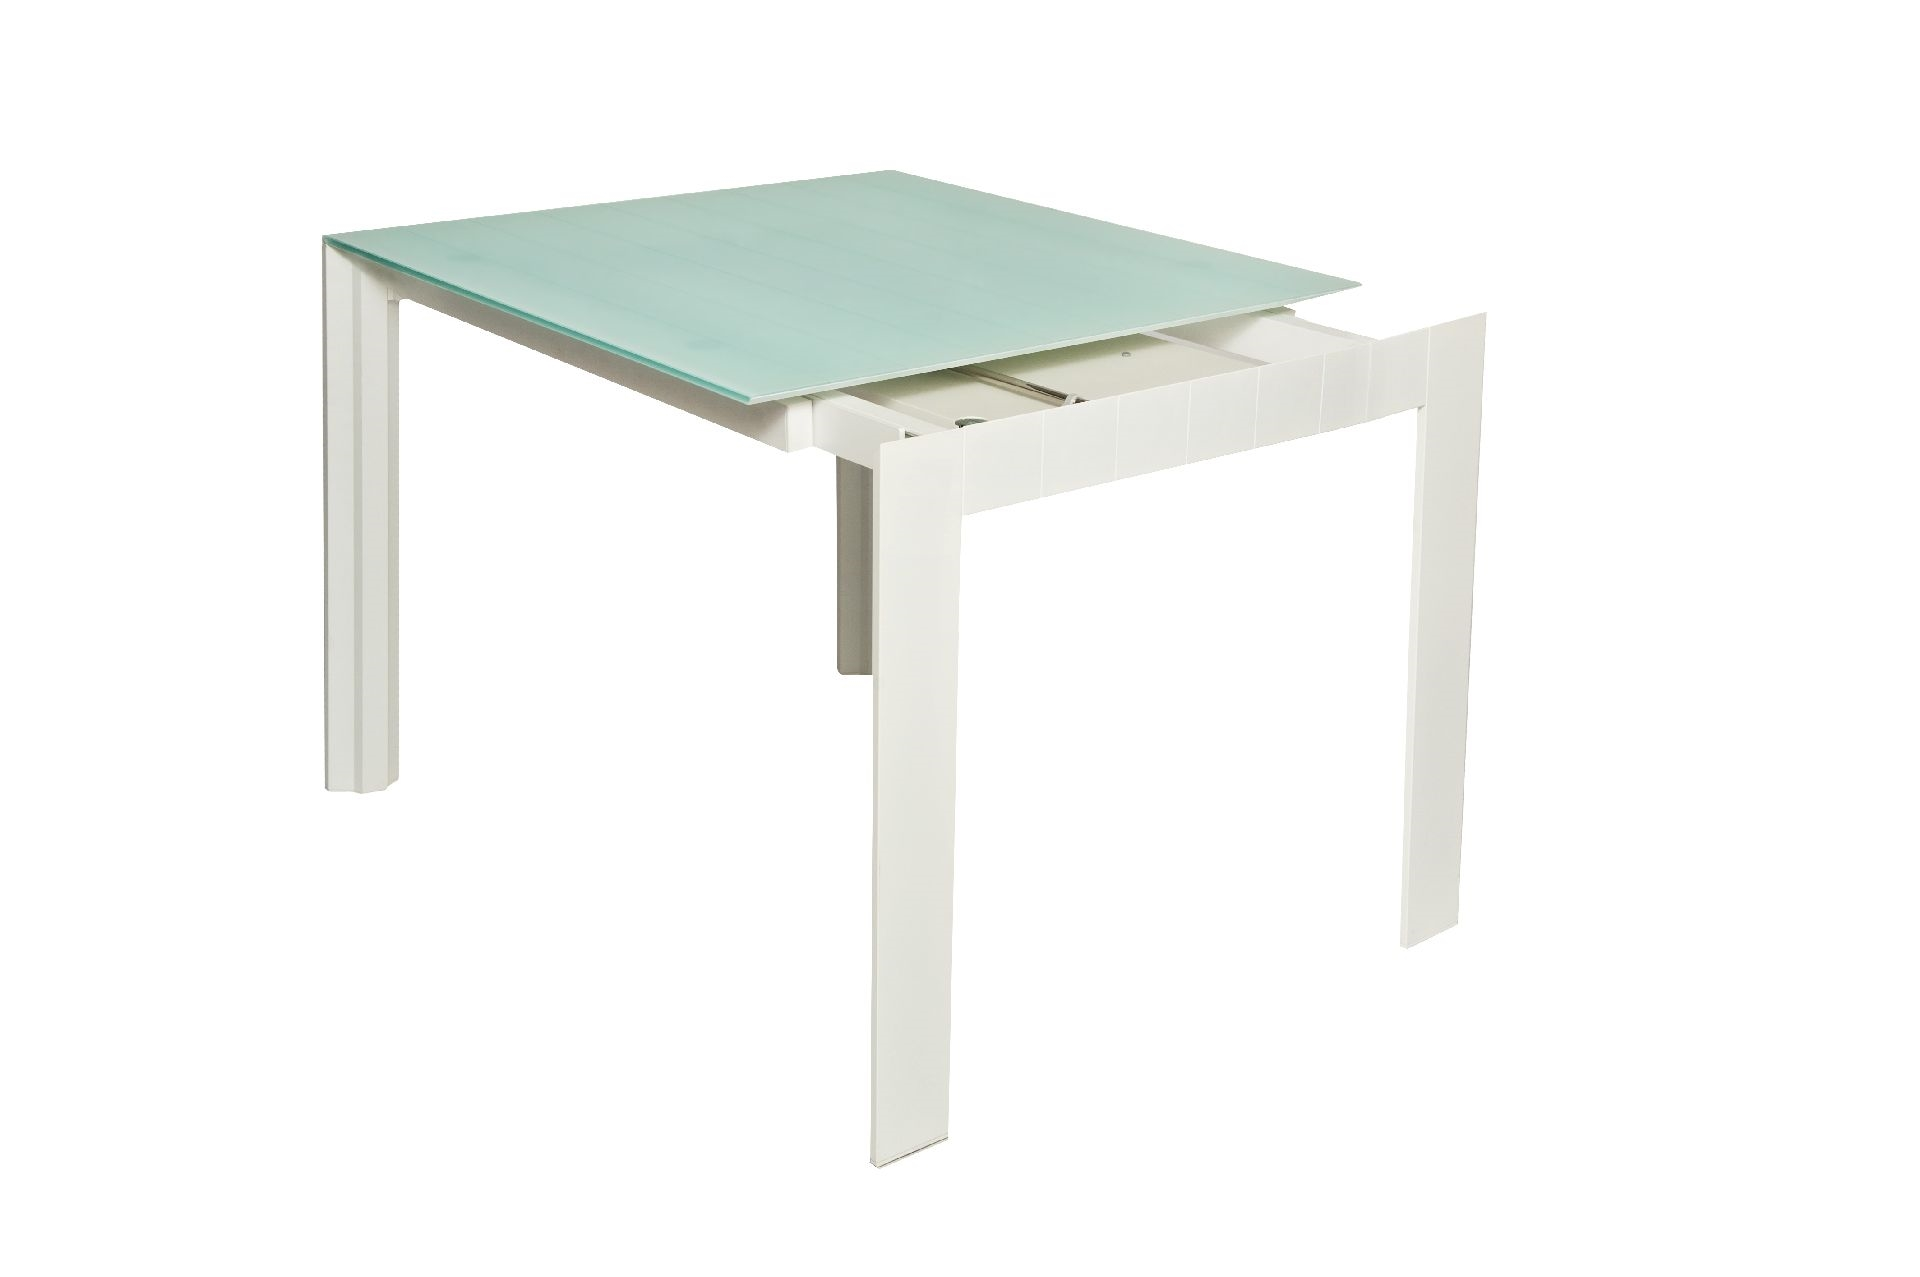 Bonaldo tavolo gross tipo quadrato allungabili con ripiano for Tavolo quadrato allungabile vetro